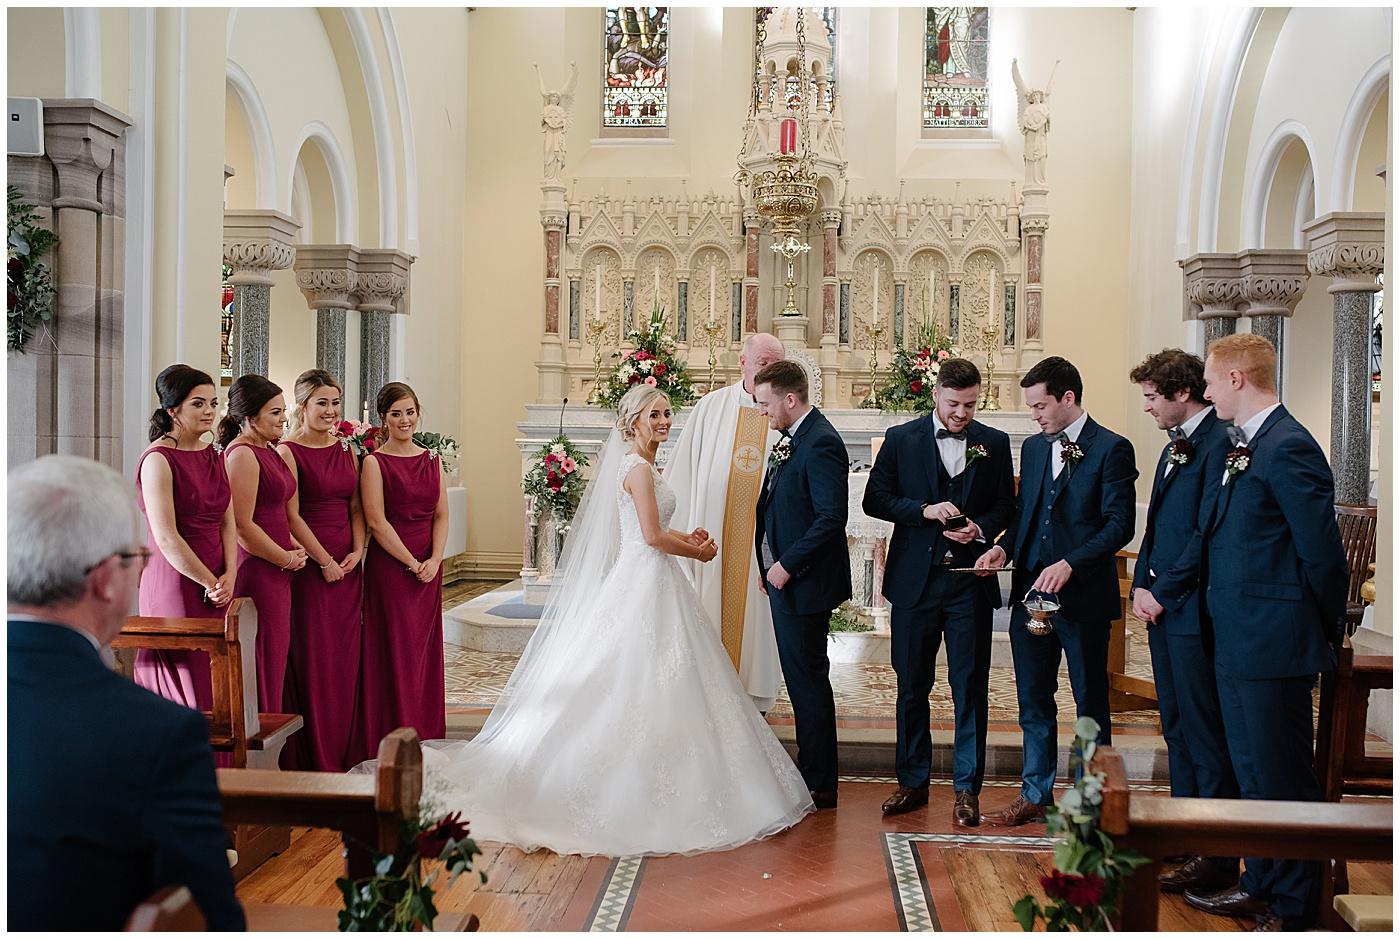 lissan-house-wedding-jude-browne-photography_0038.jpg